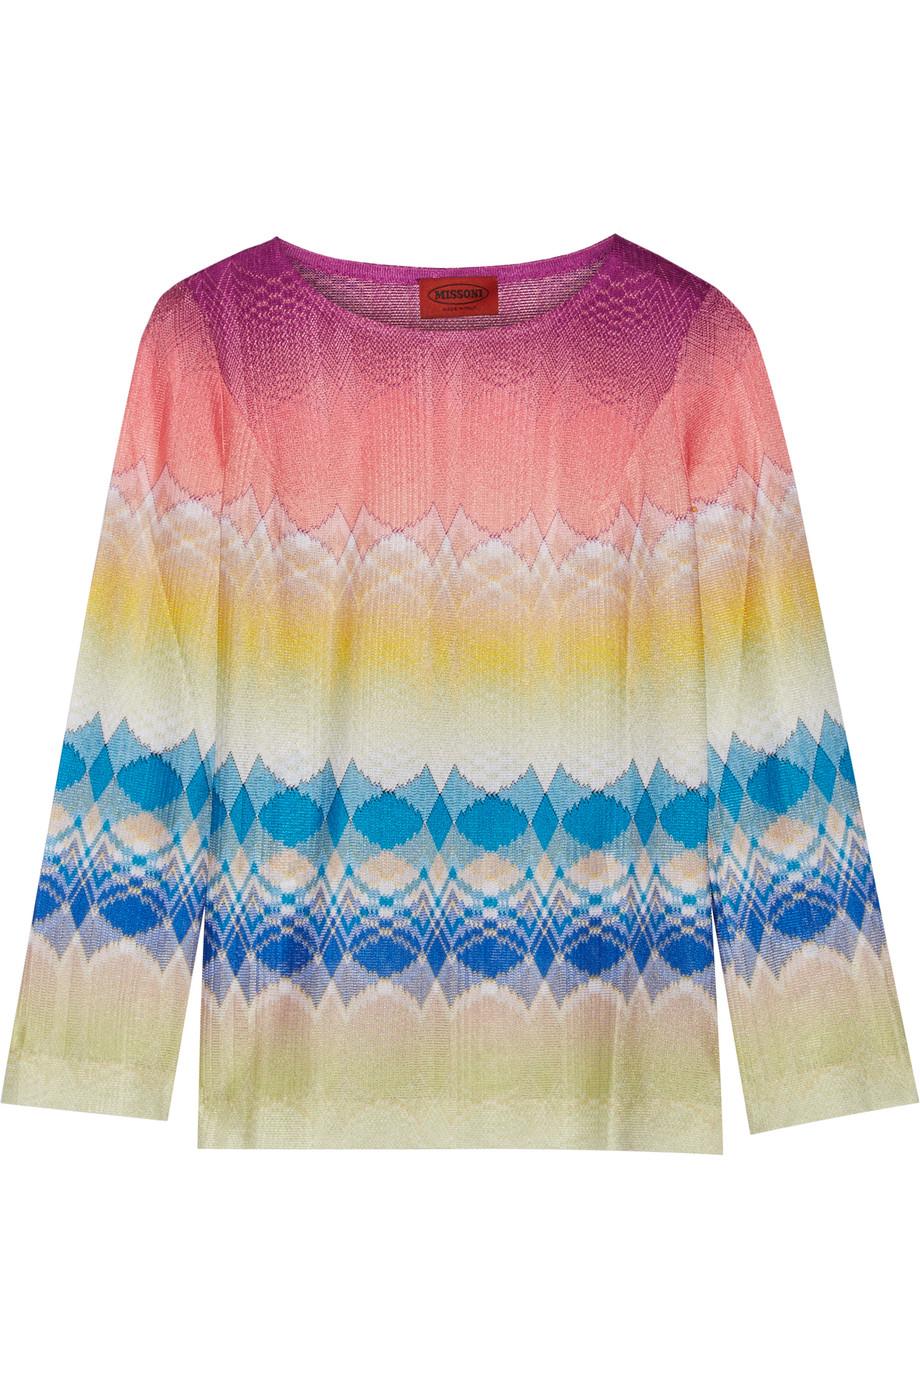 Missoni Crochet-Knit Top, Pink/Neutral, Women's, Size: 42